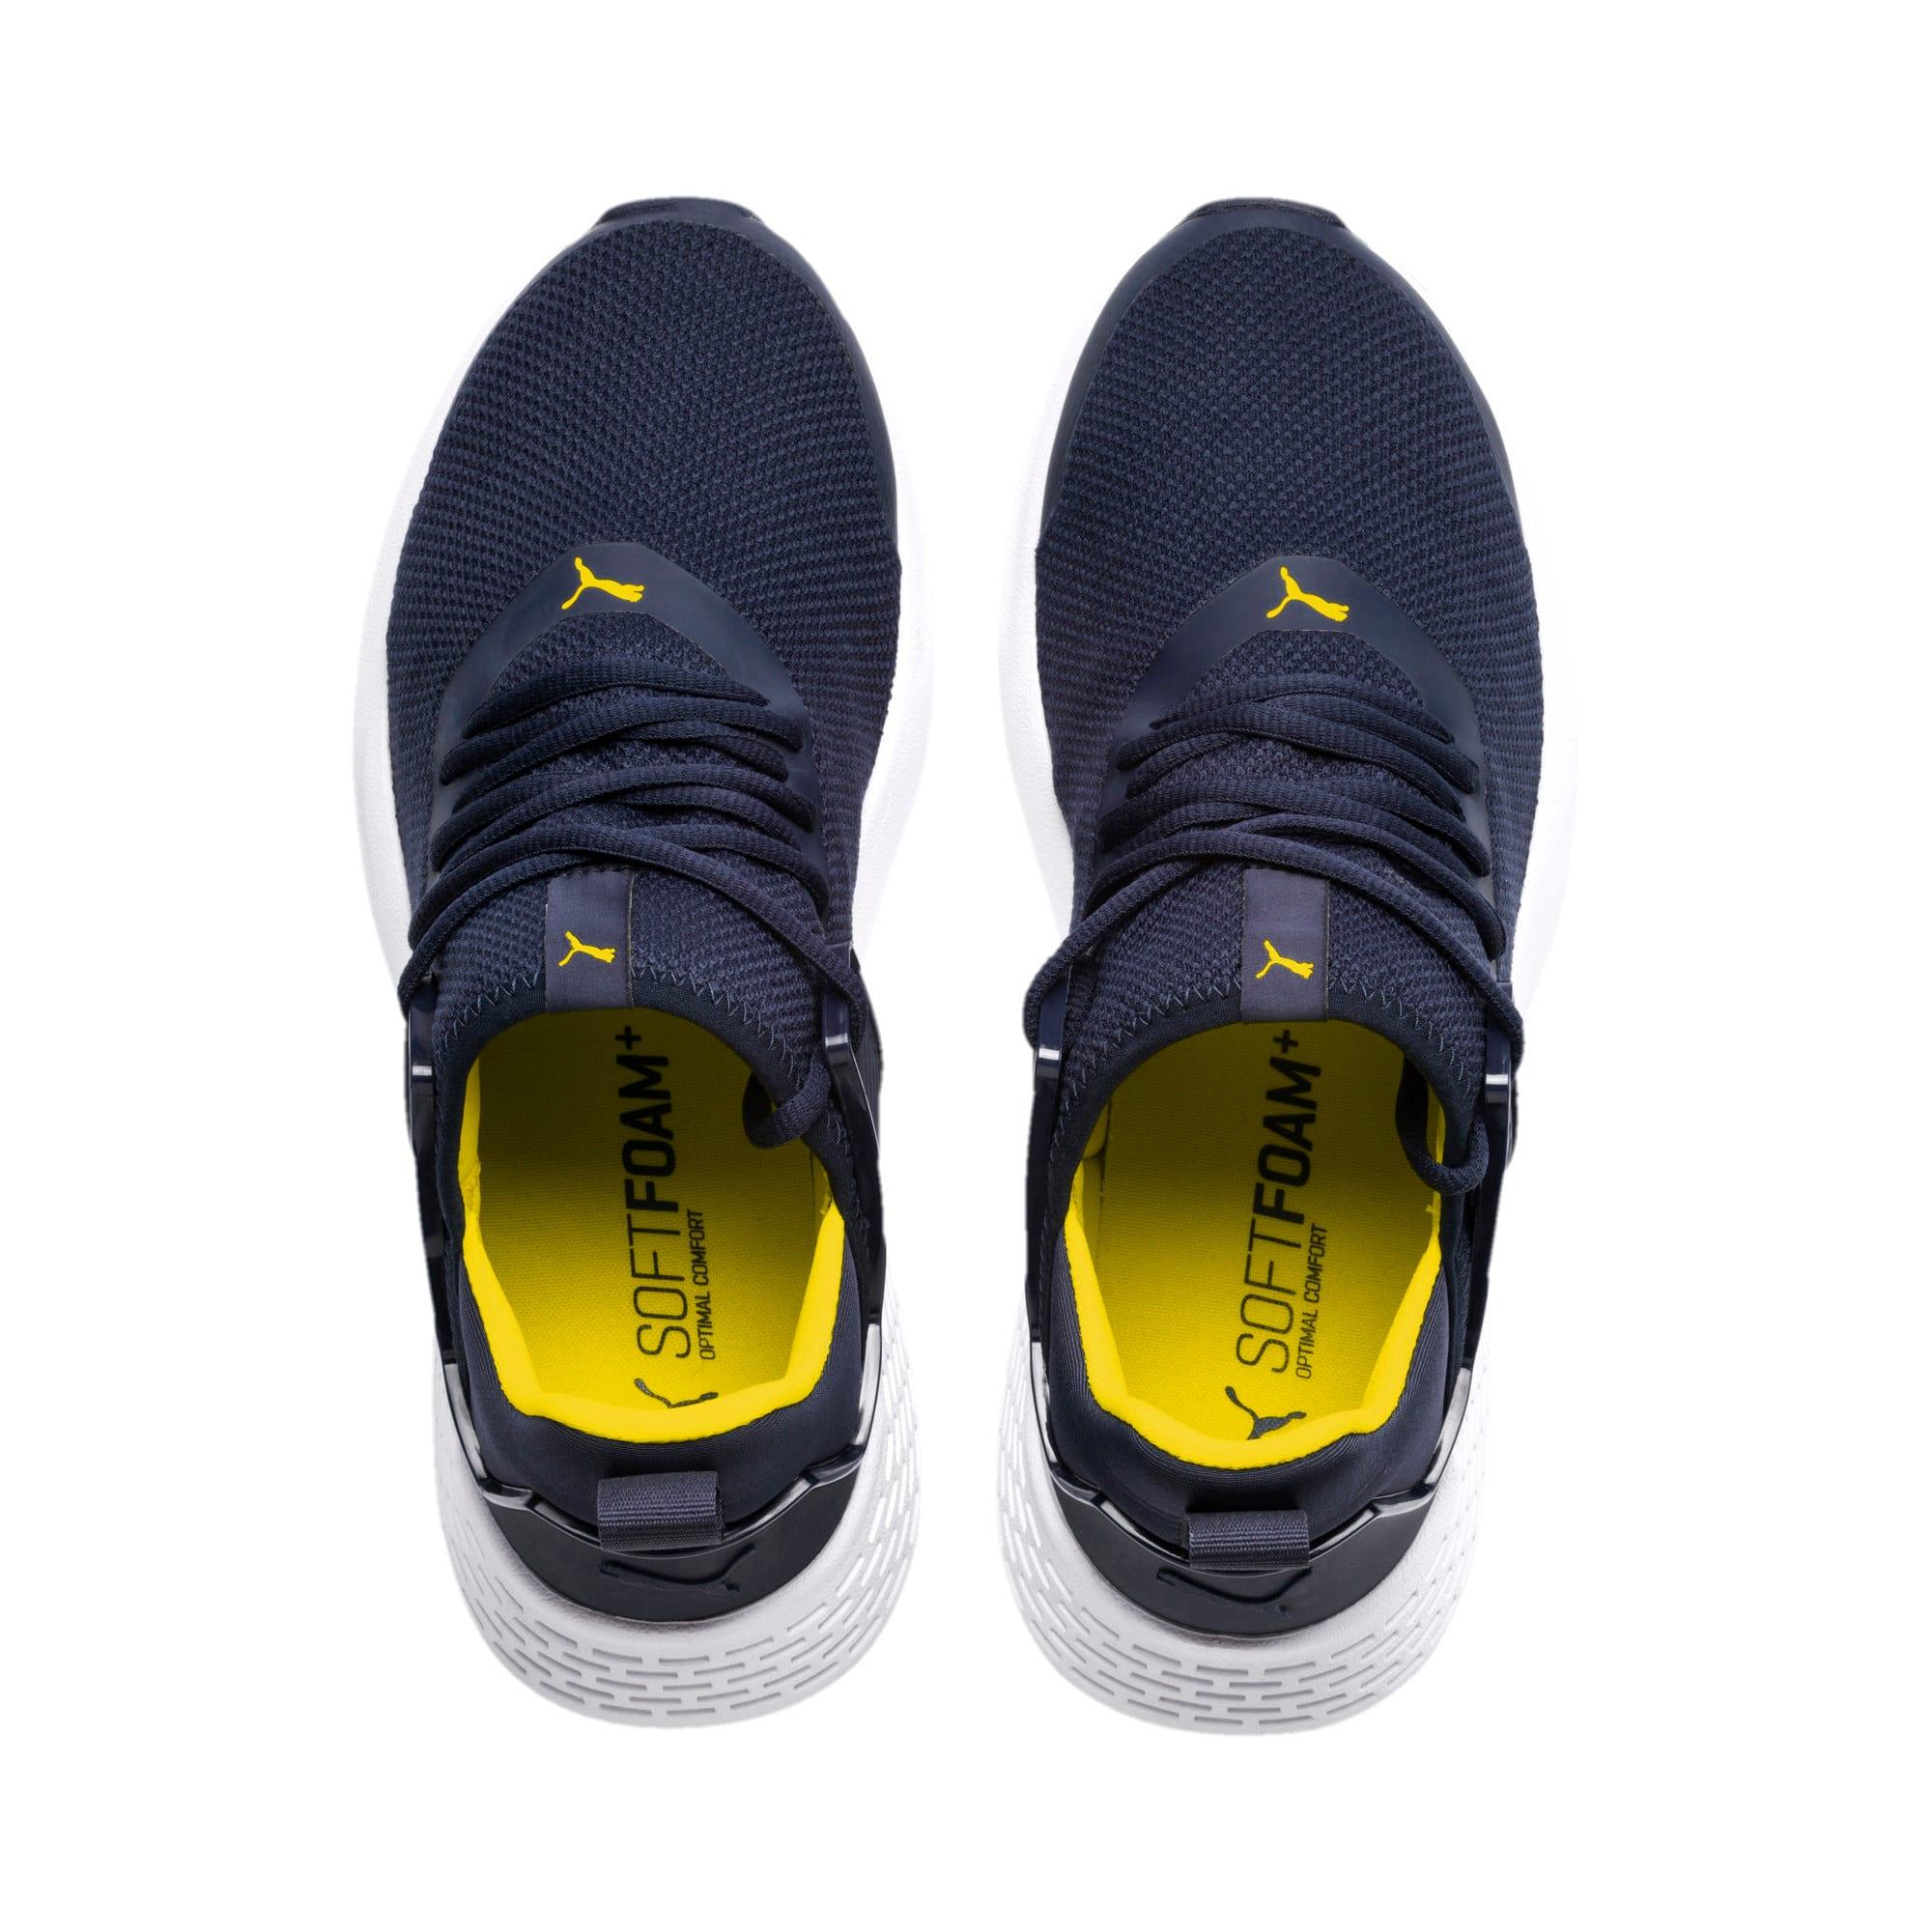 Thumbnail 6 of Insurge Mesh Sneakers, Peacoat-Blazing Yellow-White, medium-IND